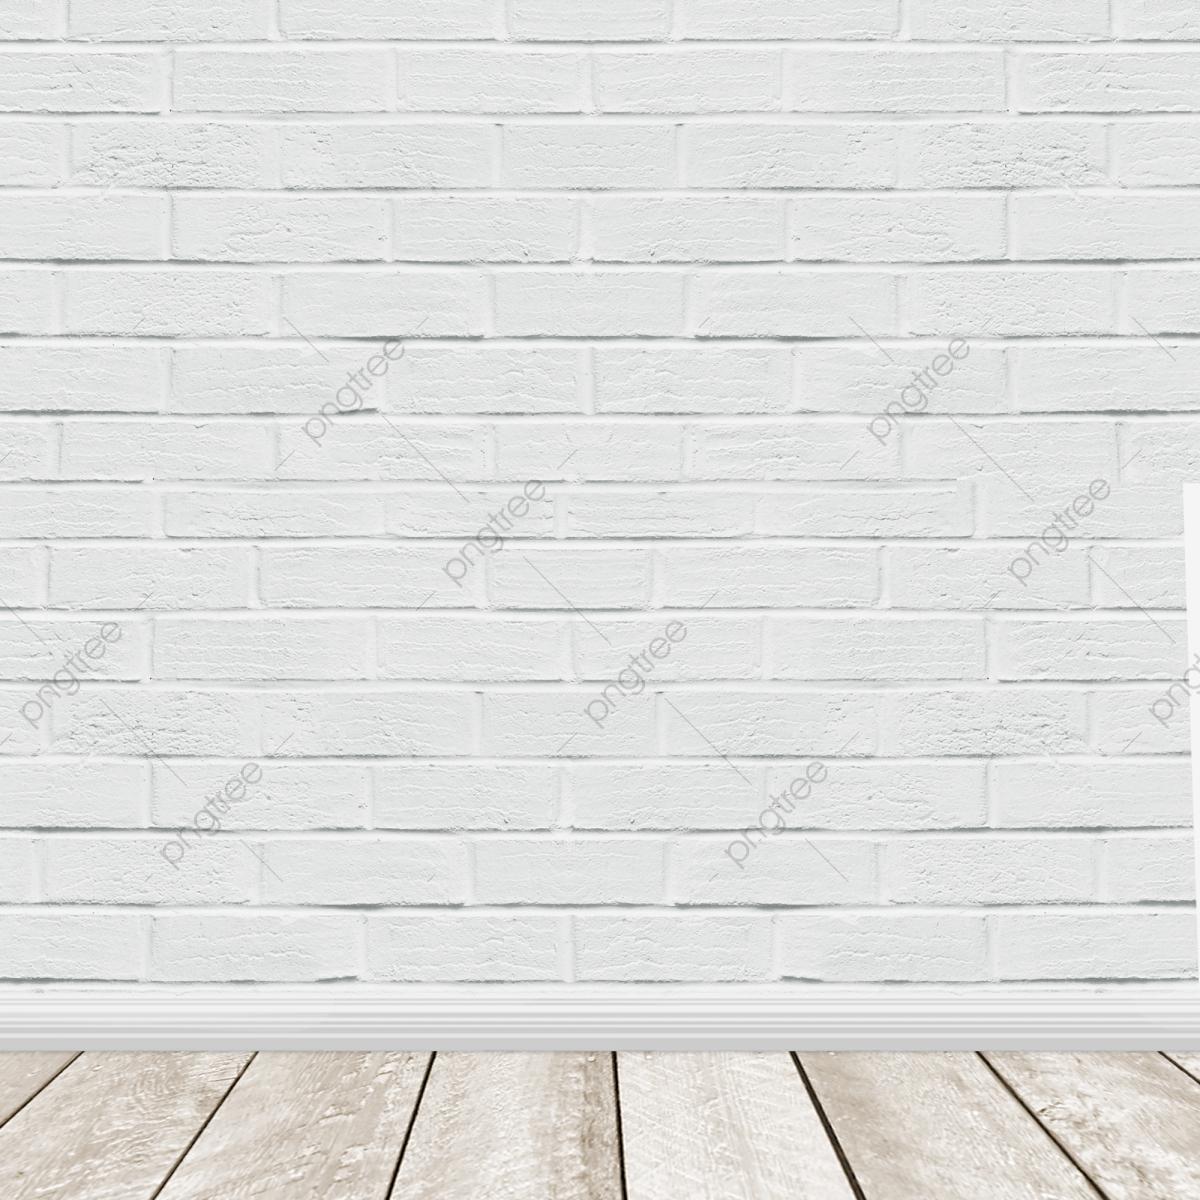 Premium White Wood Floor Texture Background, Floor, Product, Texture.